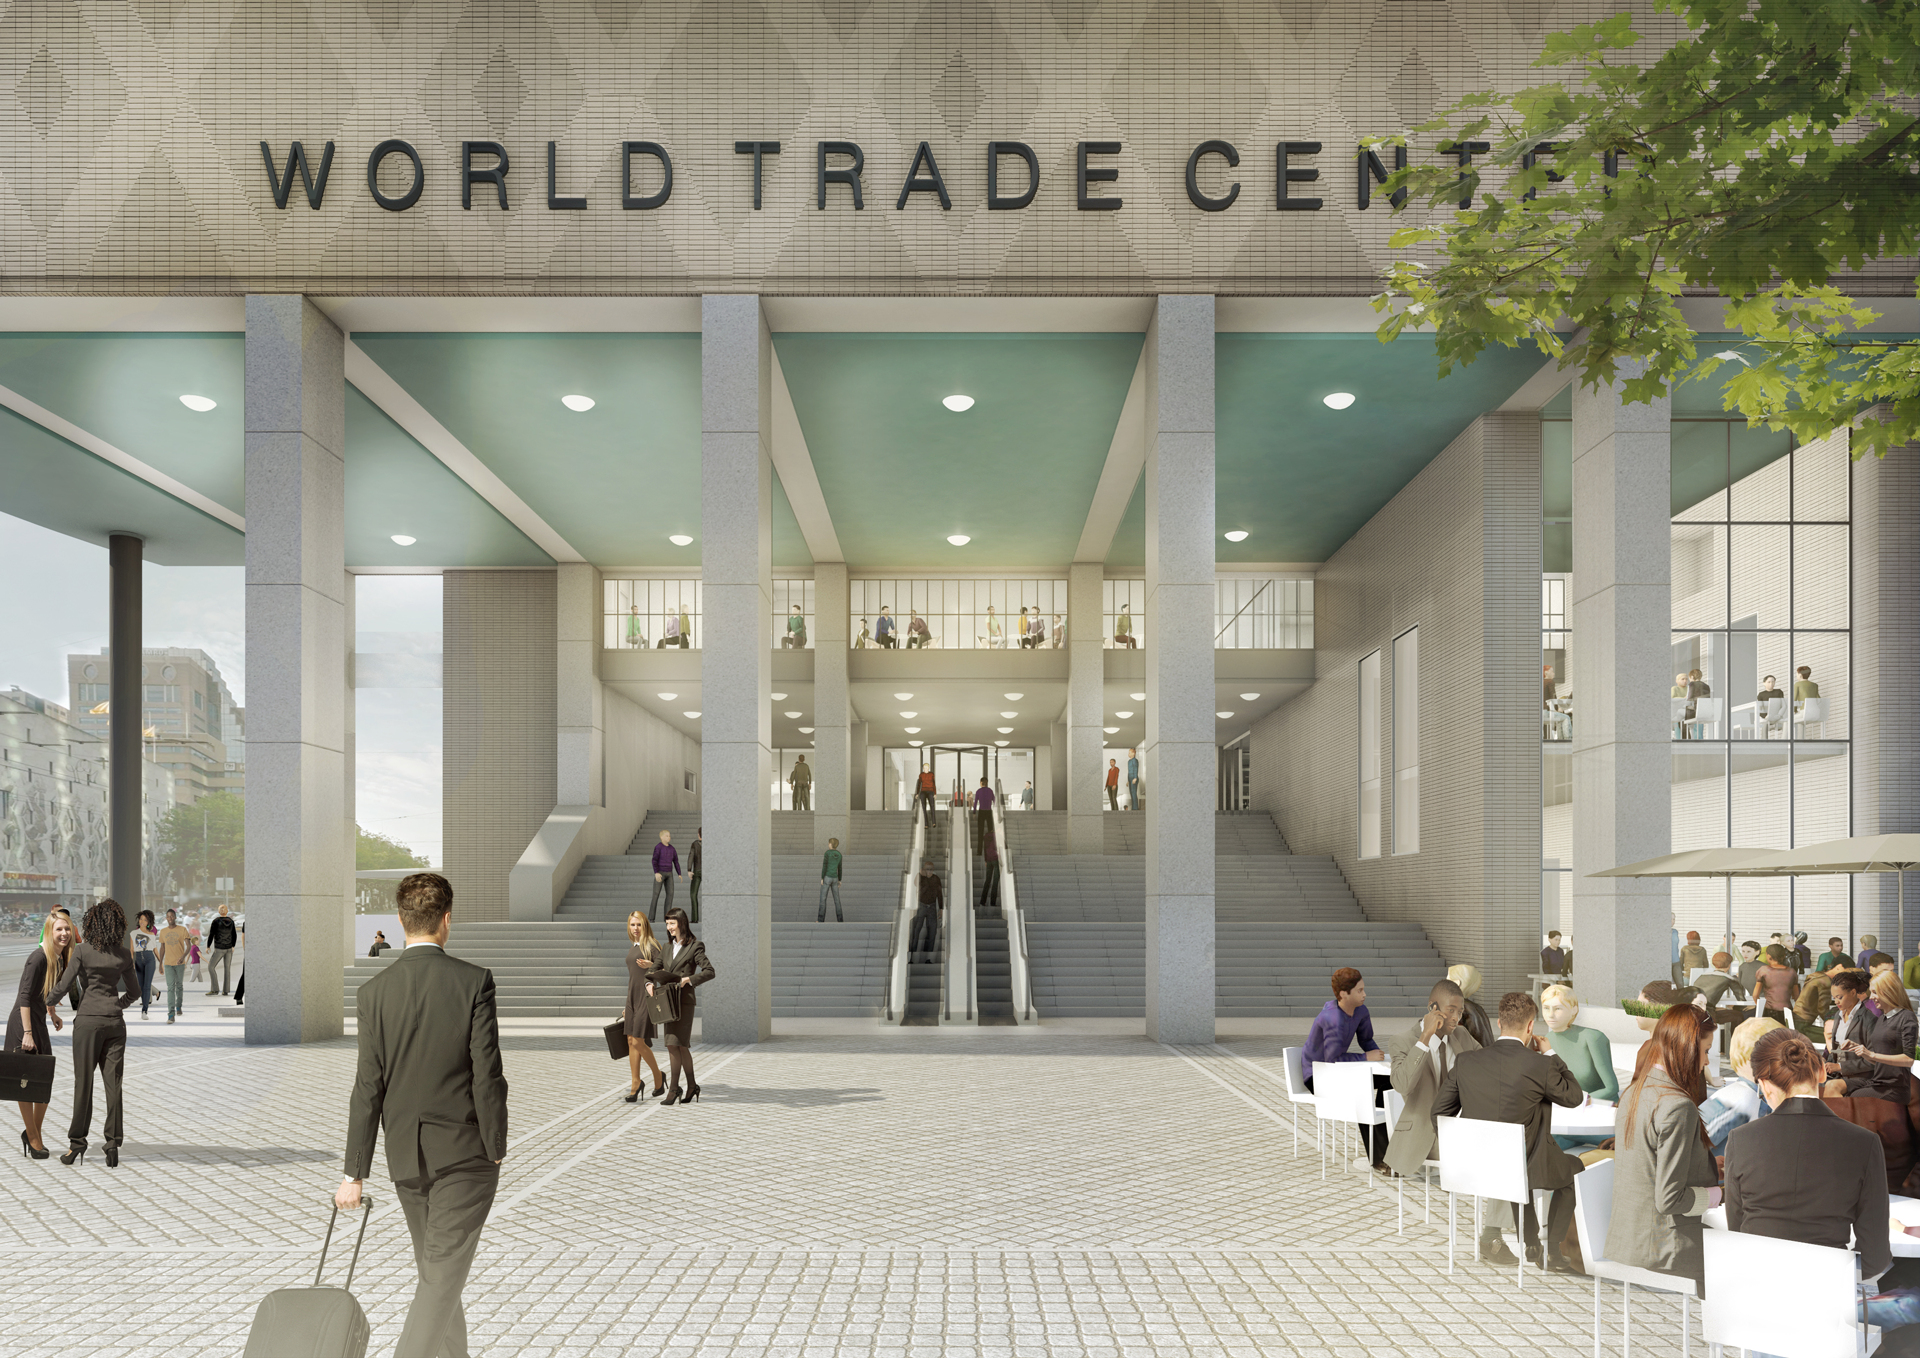 World Trade Center Rotterdam opent hotel met 168 kamers